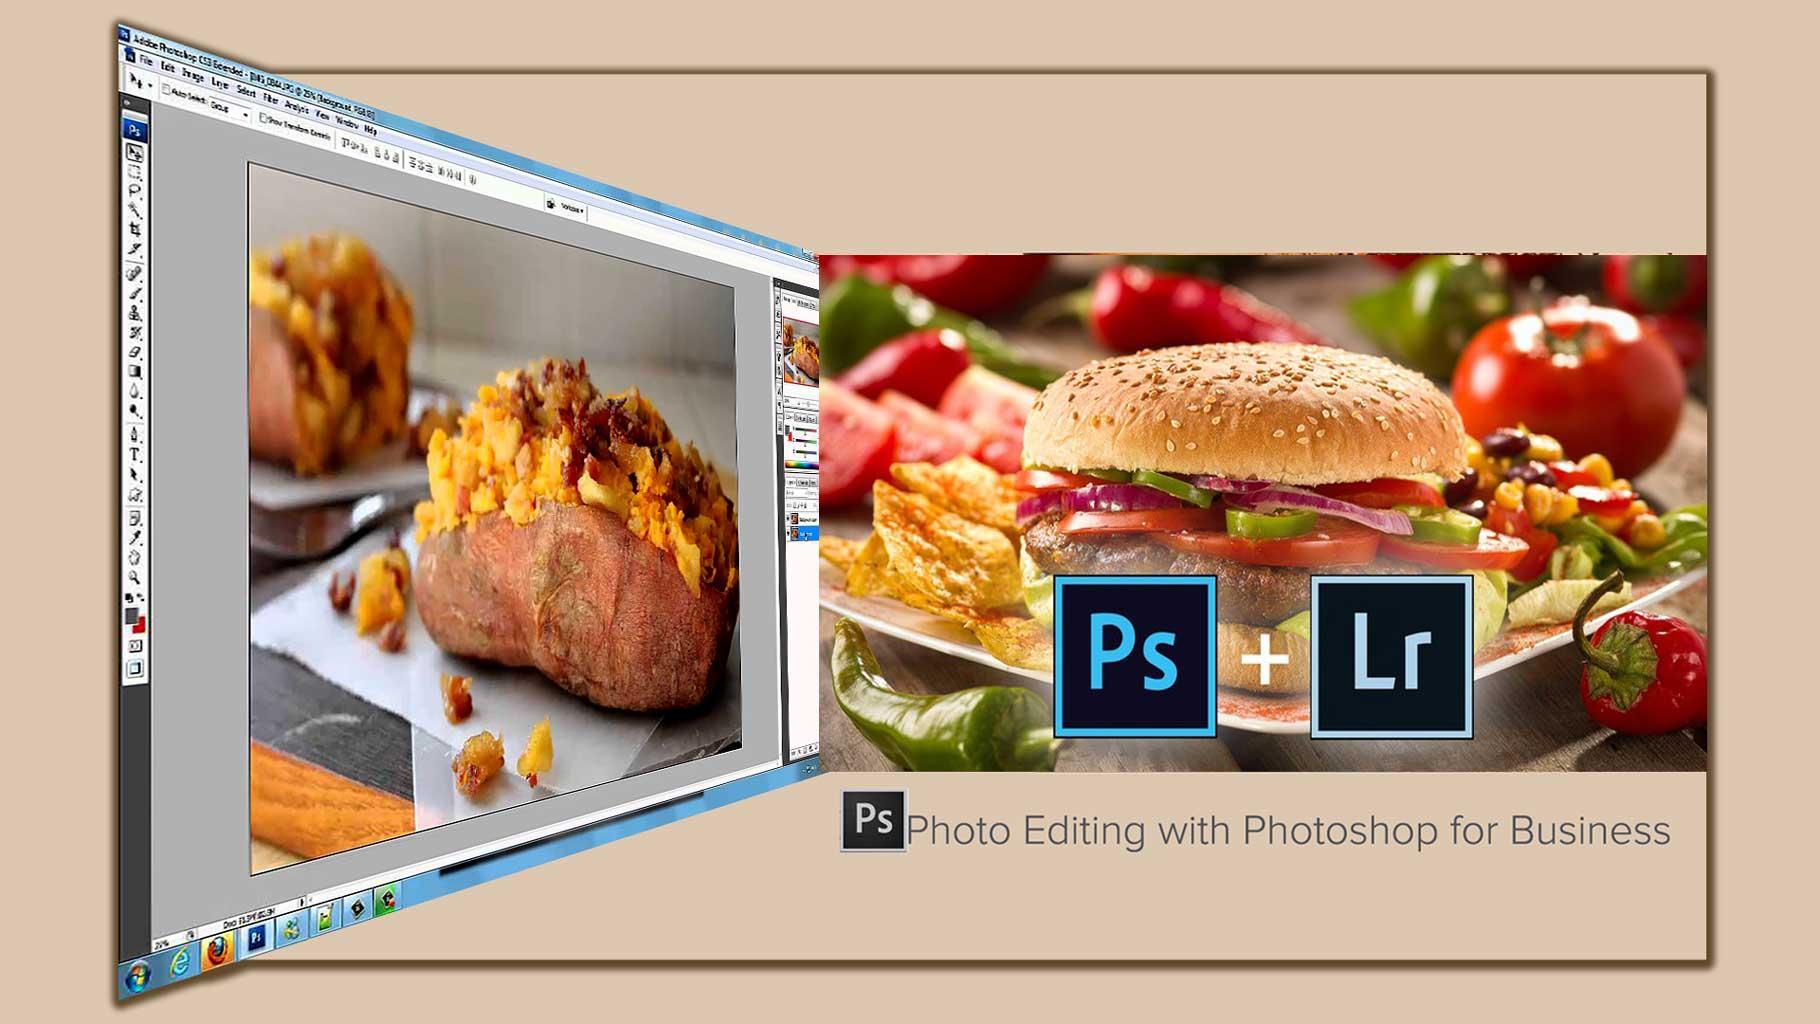 Photo editing  Photoshop 11 - 8 تا از مزایای اصلی ویرایش عکس با فتوشاپ برای کسب و کارتان